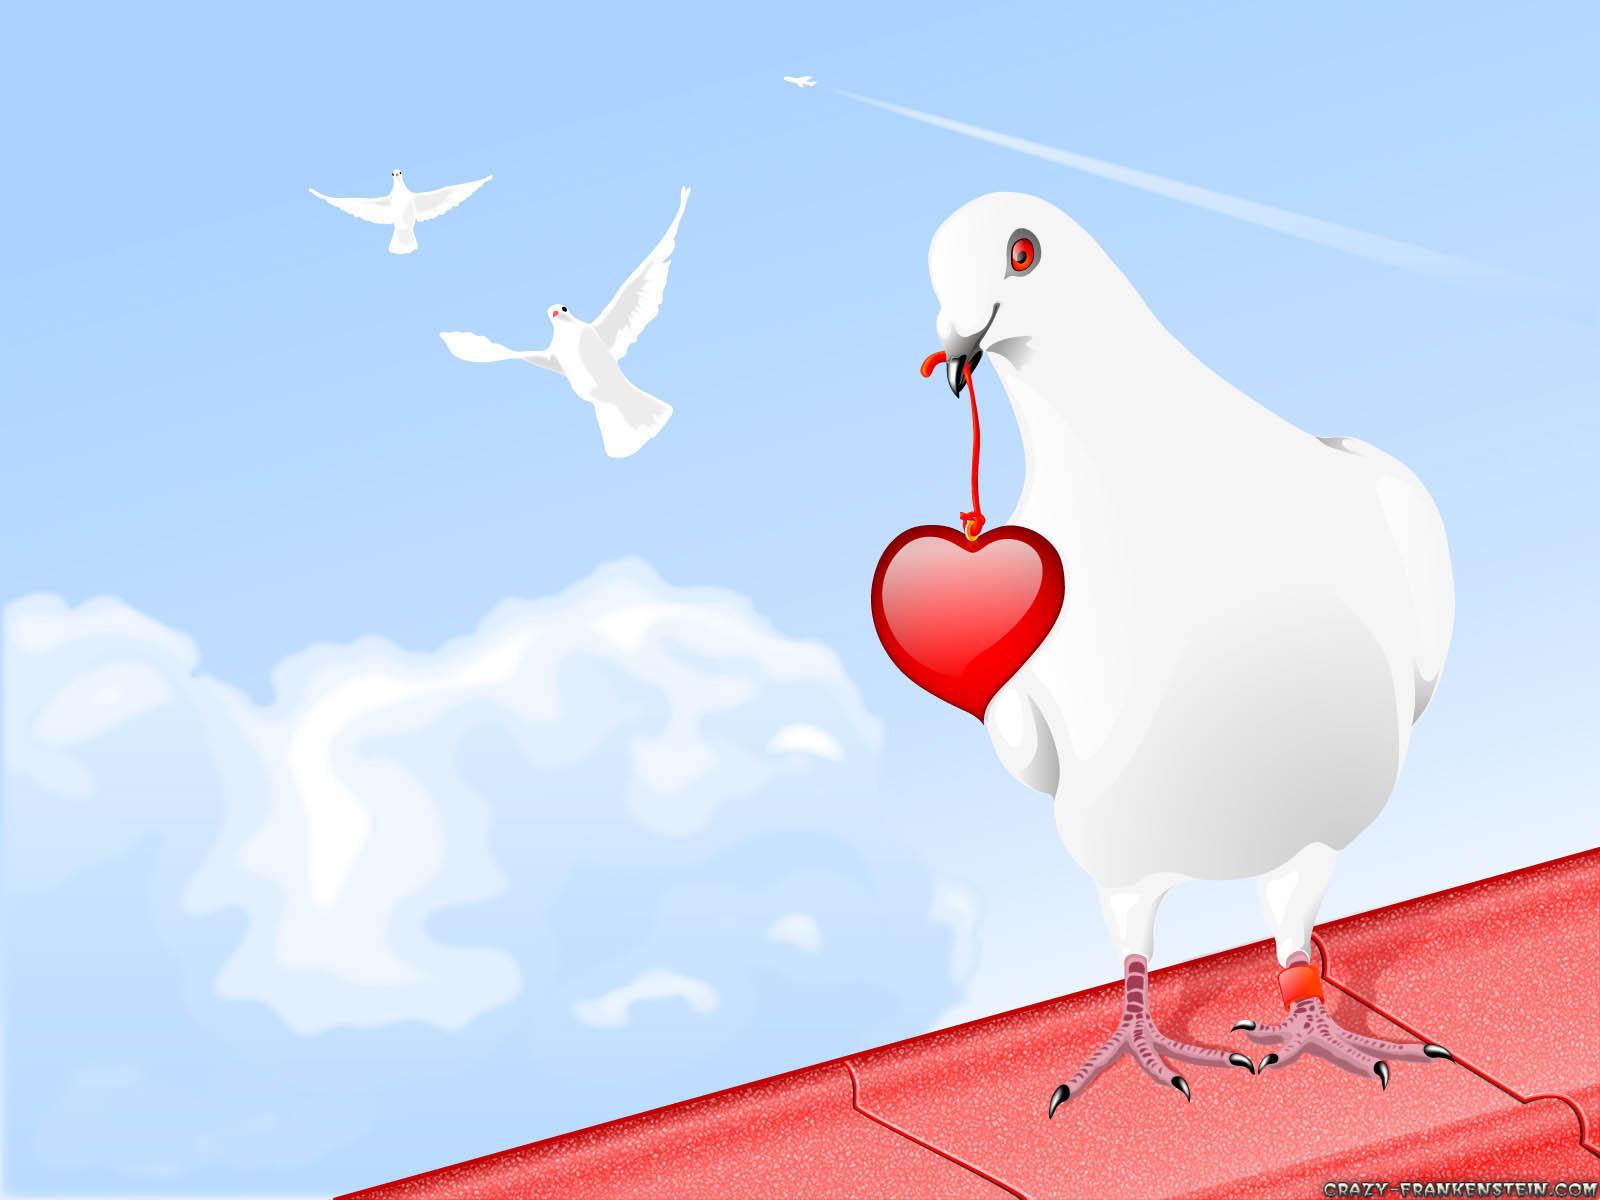 حروف لا تقرأ بالعين بل بالقلب White-pigeon-red-heart-1600x1200-love-wallpapers